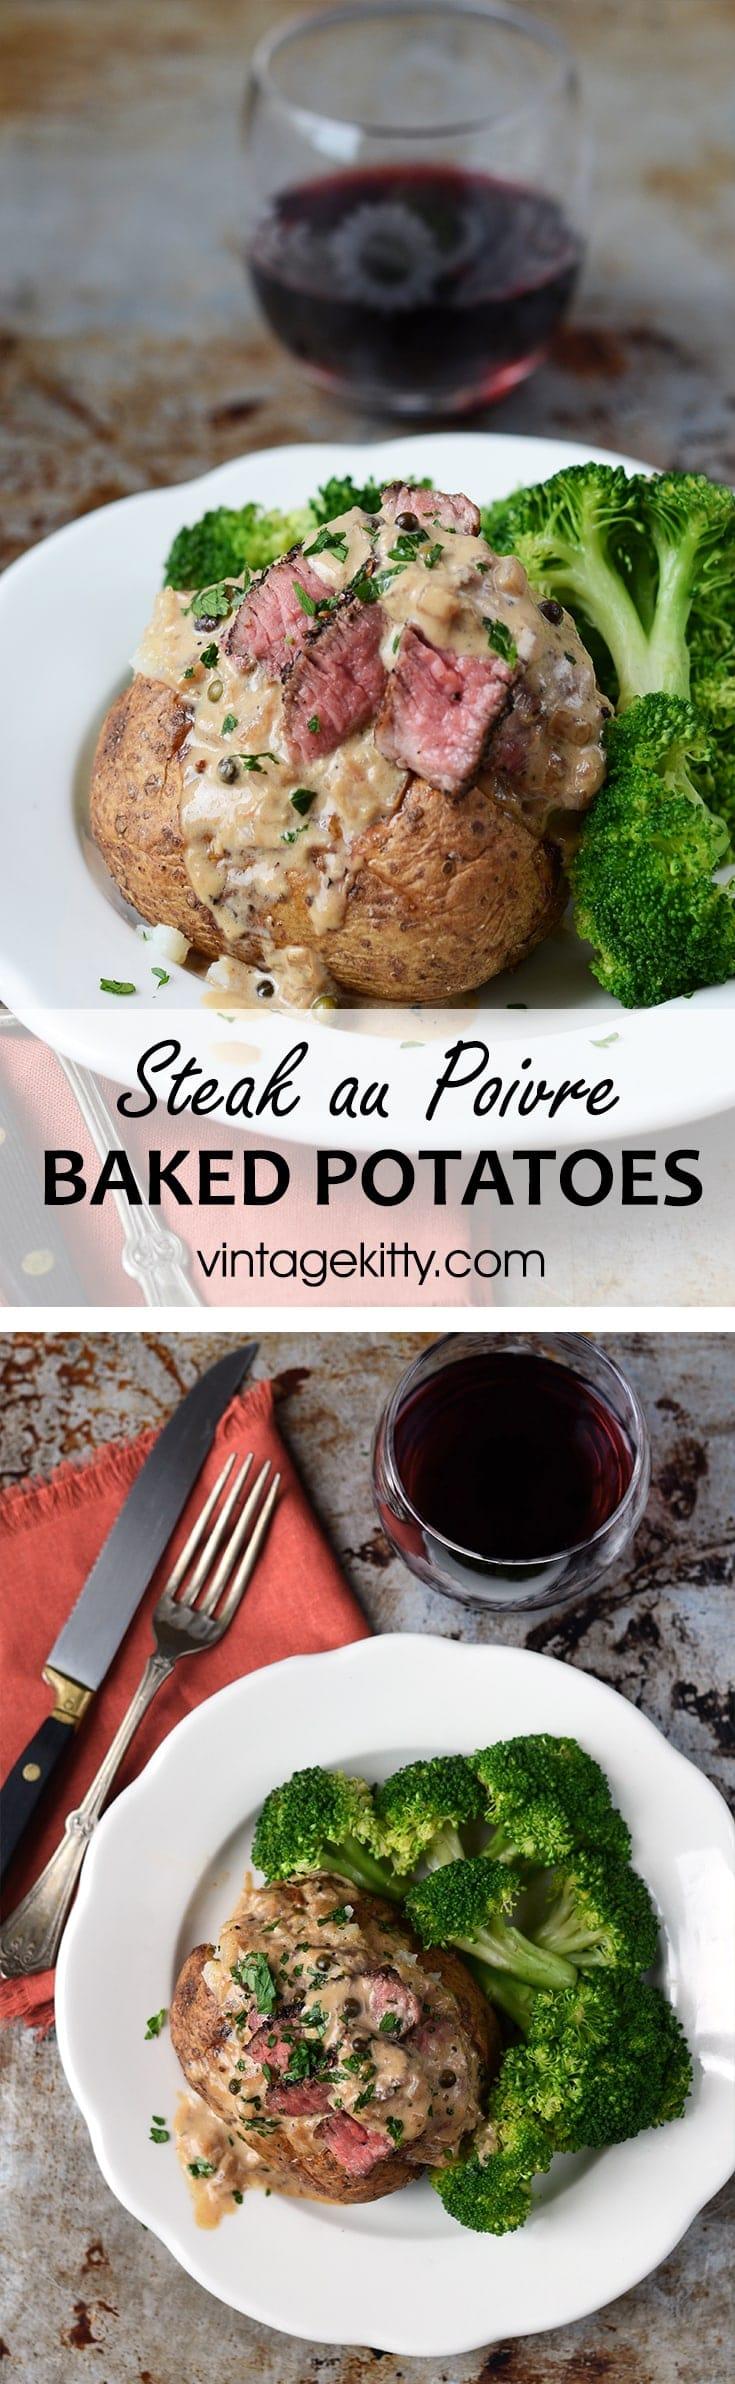 Steak au Poivre Baked Potatoes Pin - Easy Steak au Poivre Baked Potatoes